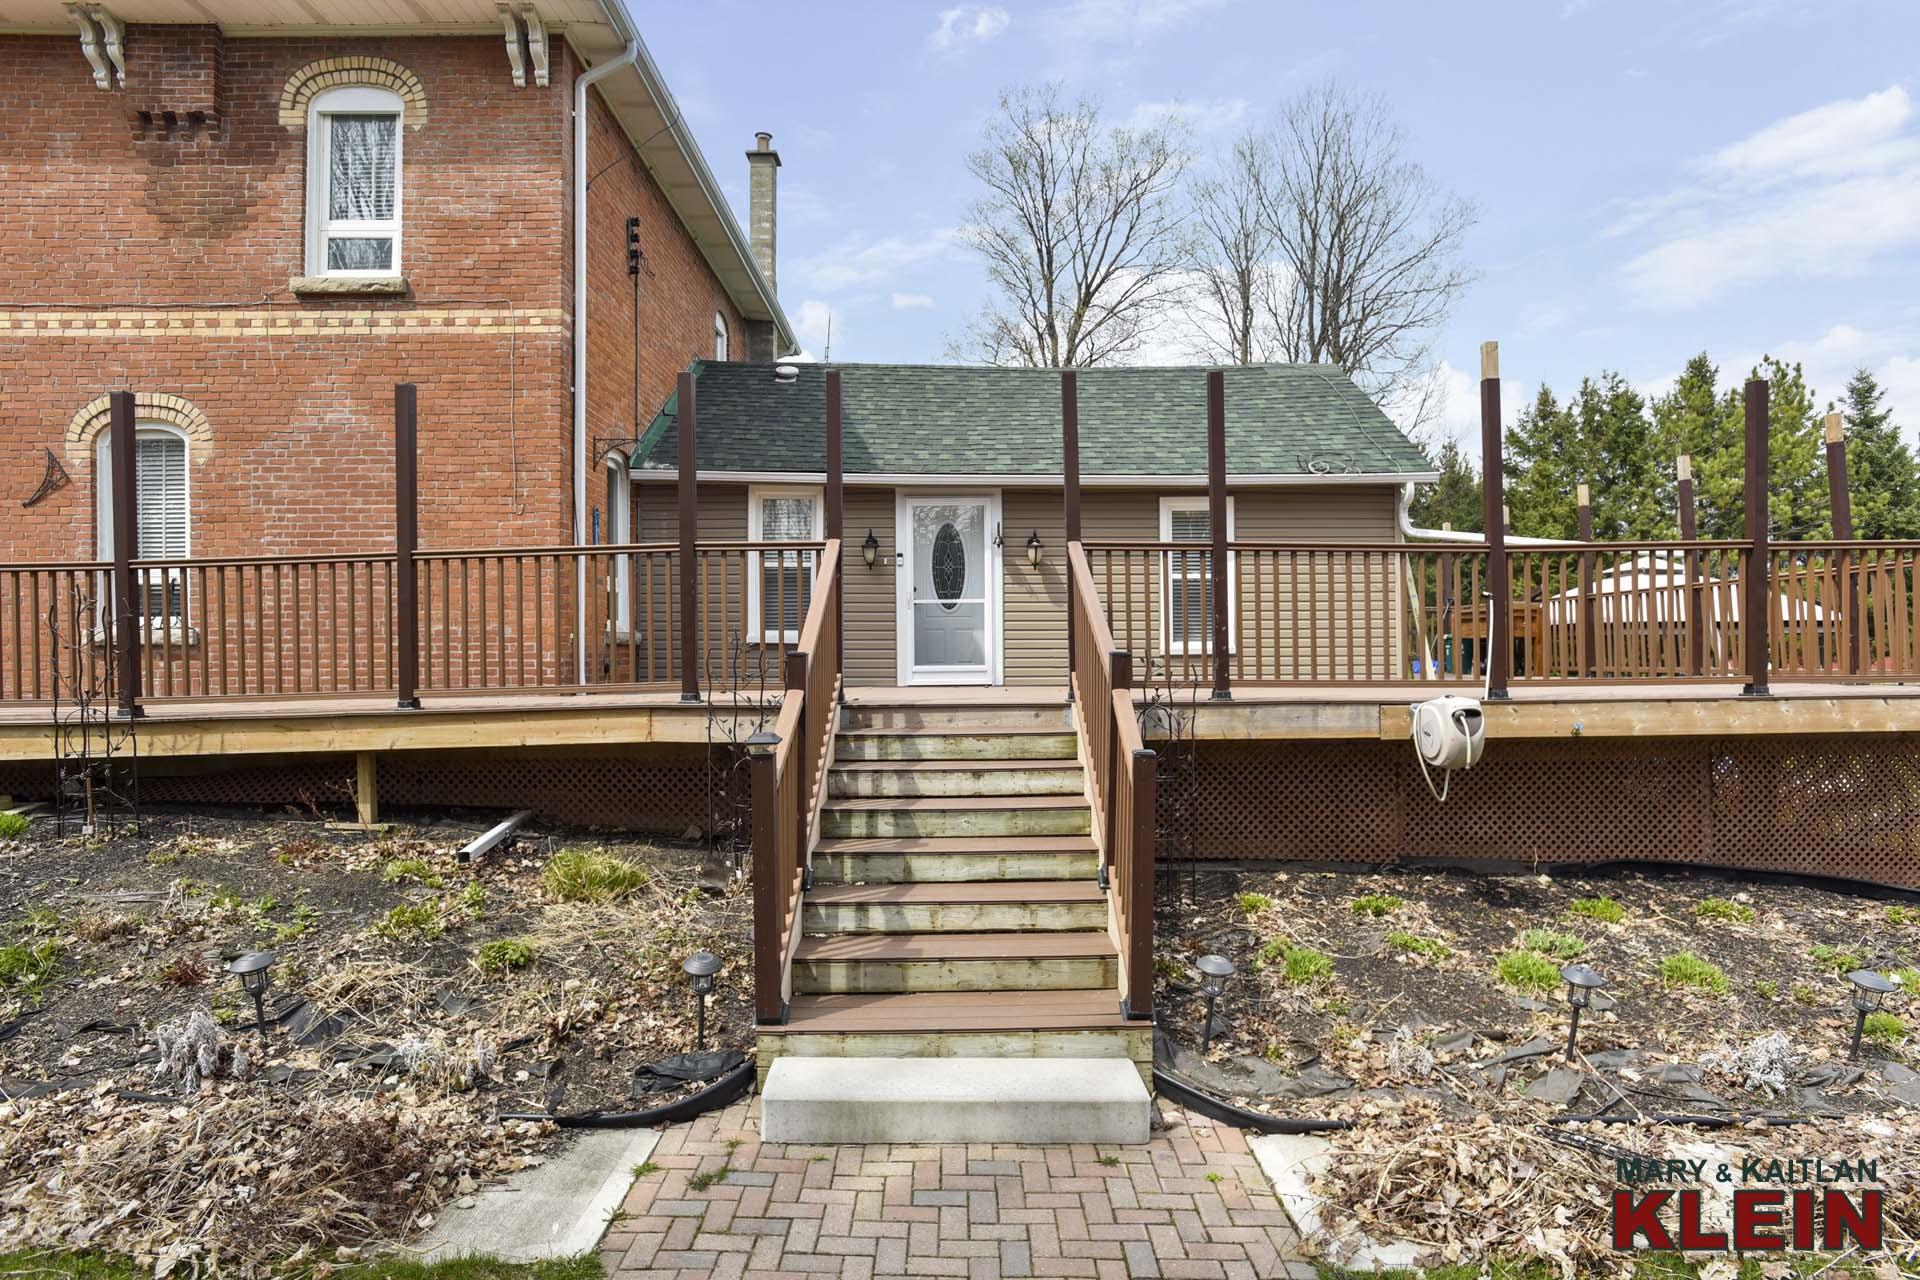 Klein, Home for sale in Mono, Farm, Acreage